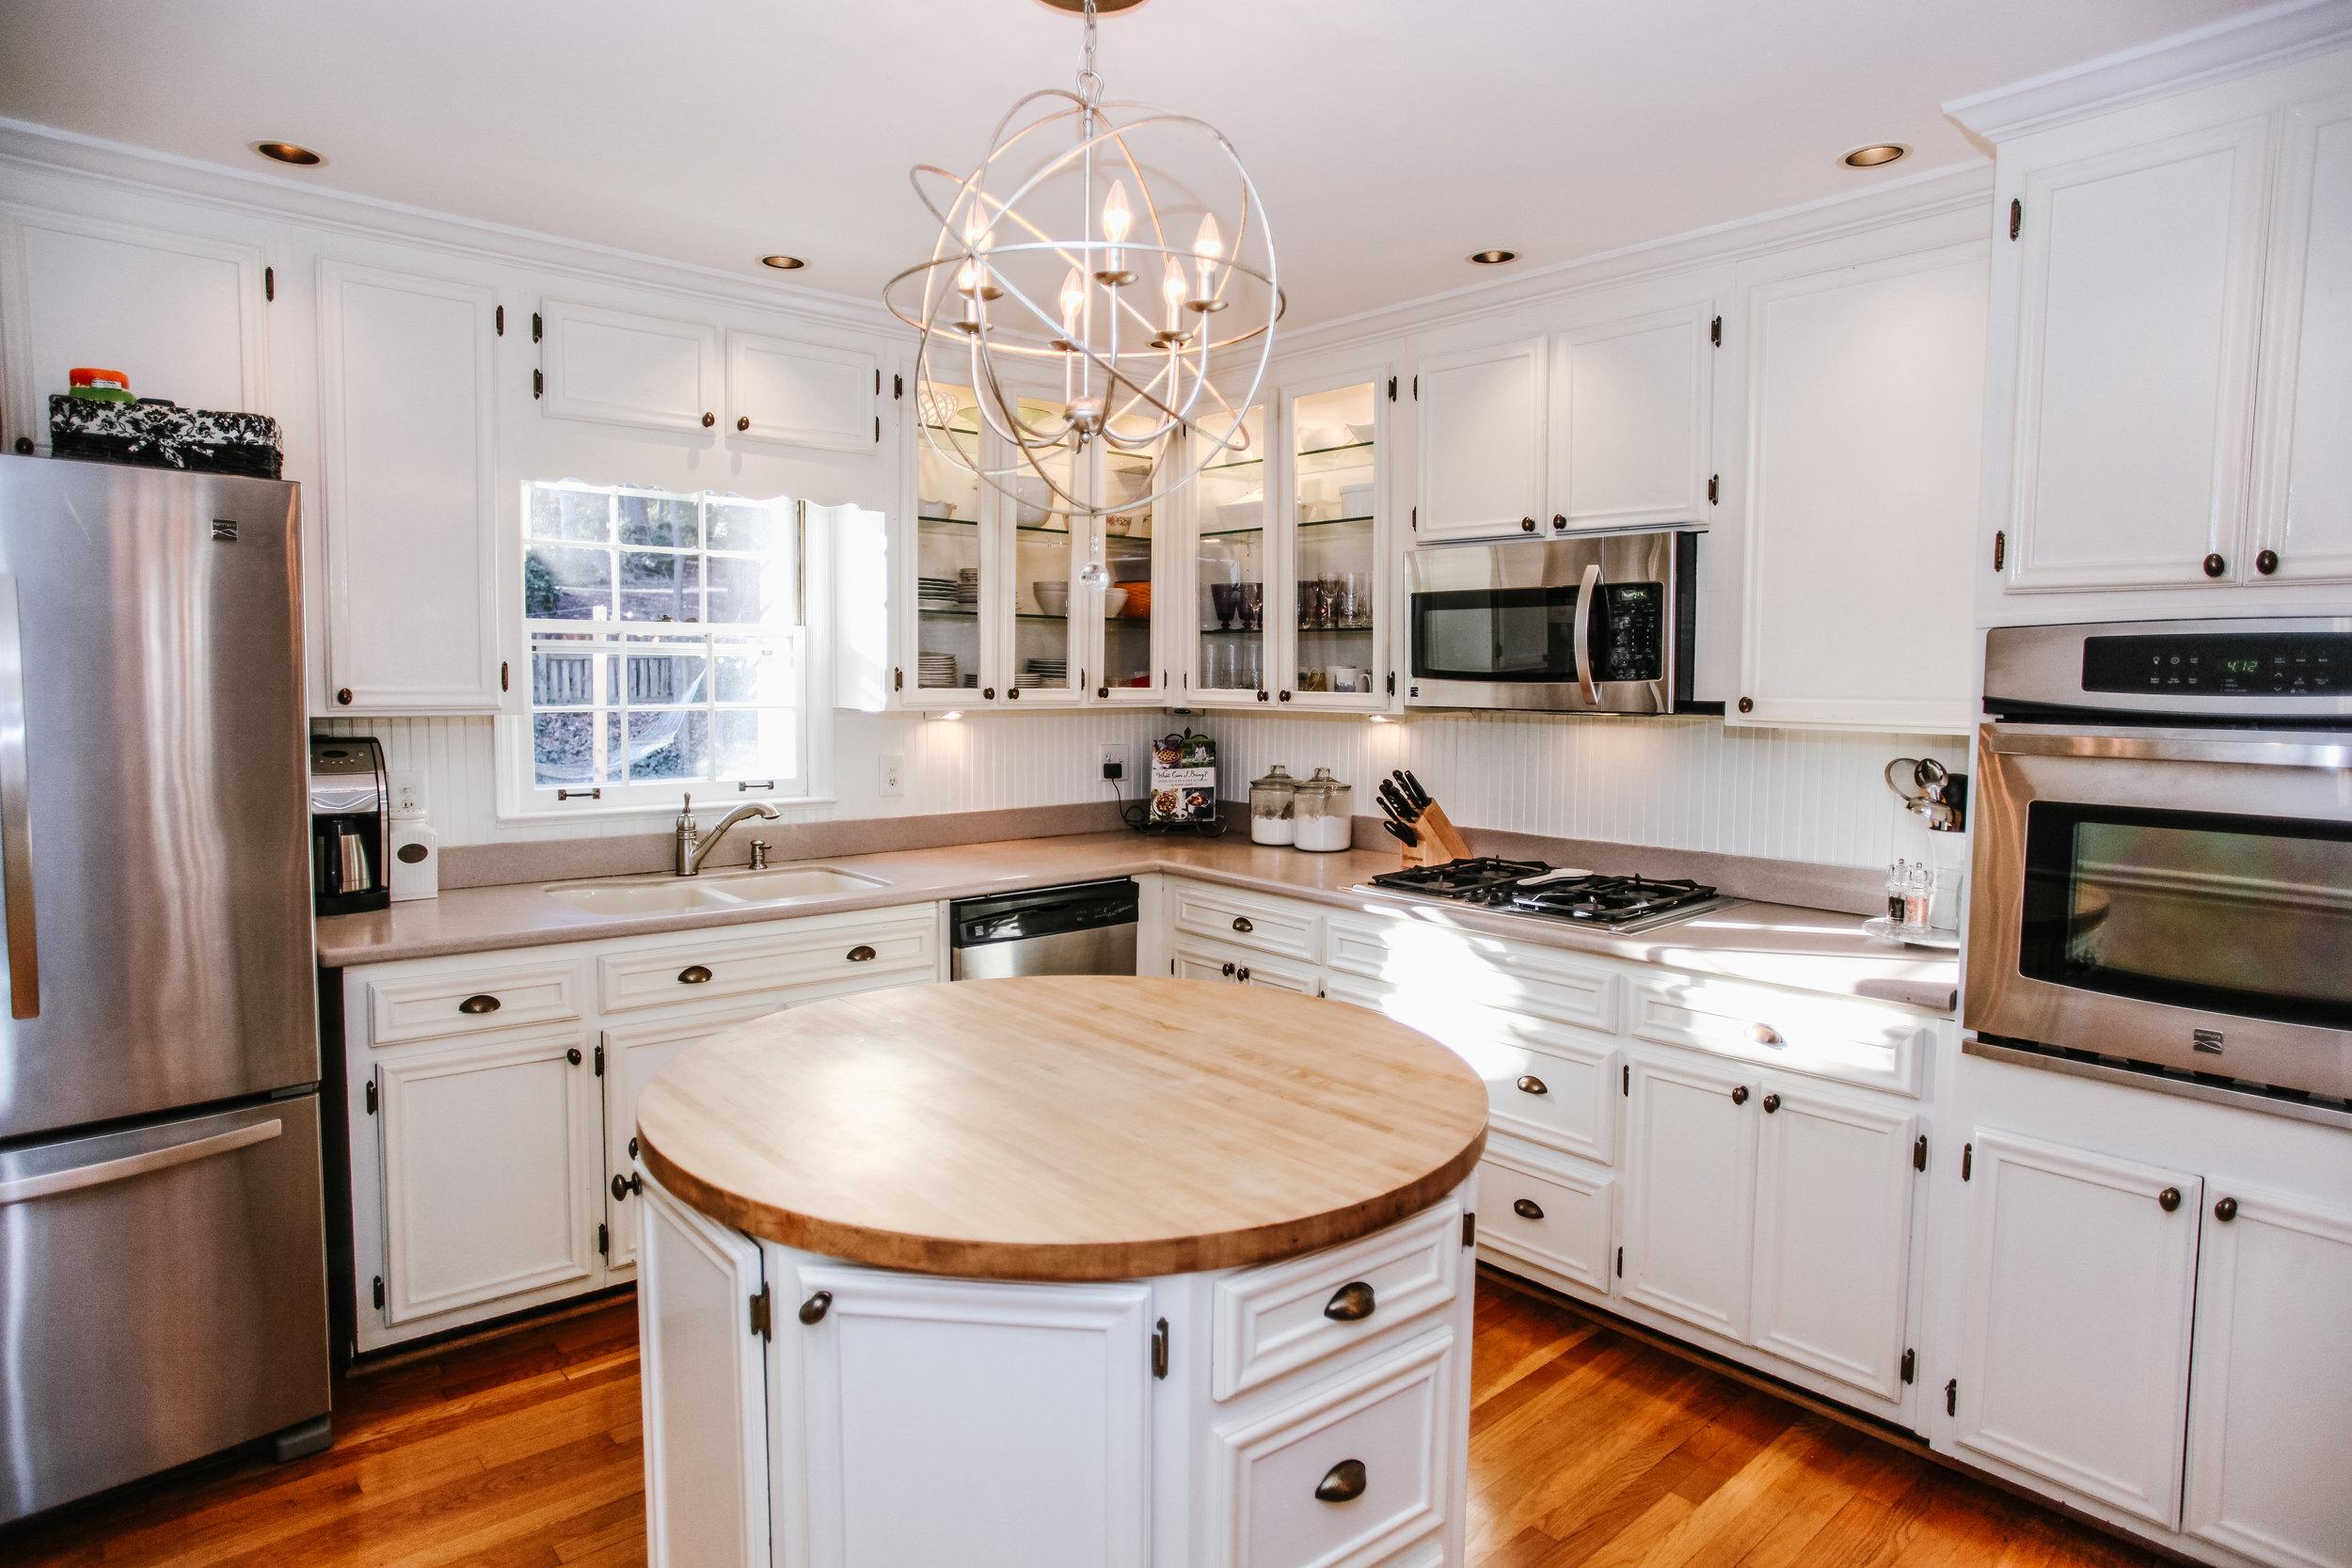 wingard-real-estate-sandy-springs-dream-home-backyard-goals-atlanta-buckhead-50.jpg